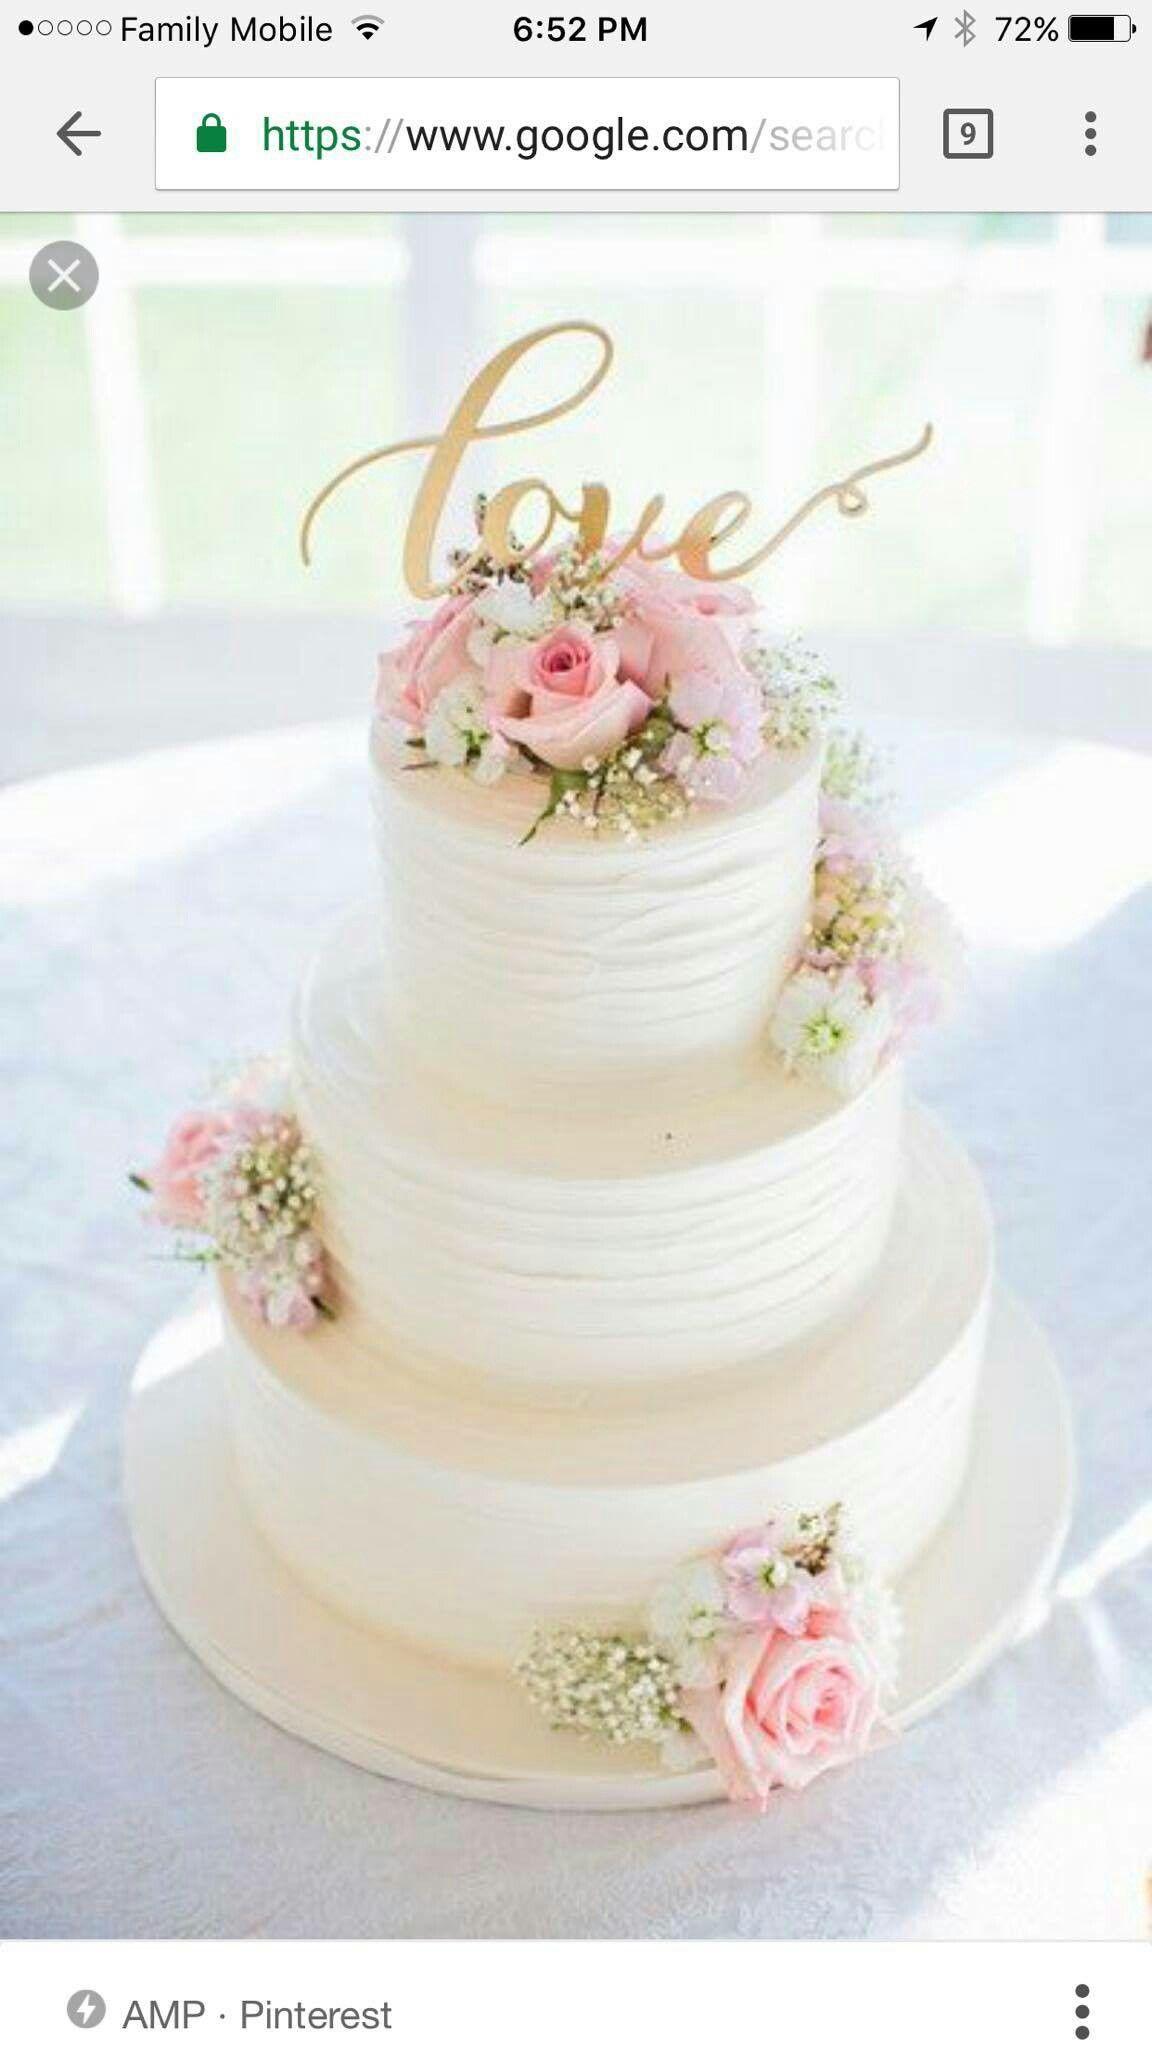 Pin by Naty Alvarez on Delicias | Pinterest | Wedding cake, Cake and ...